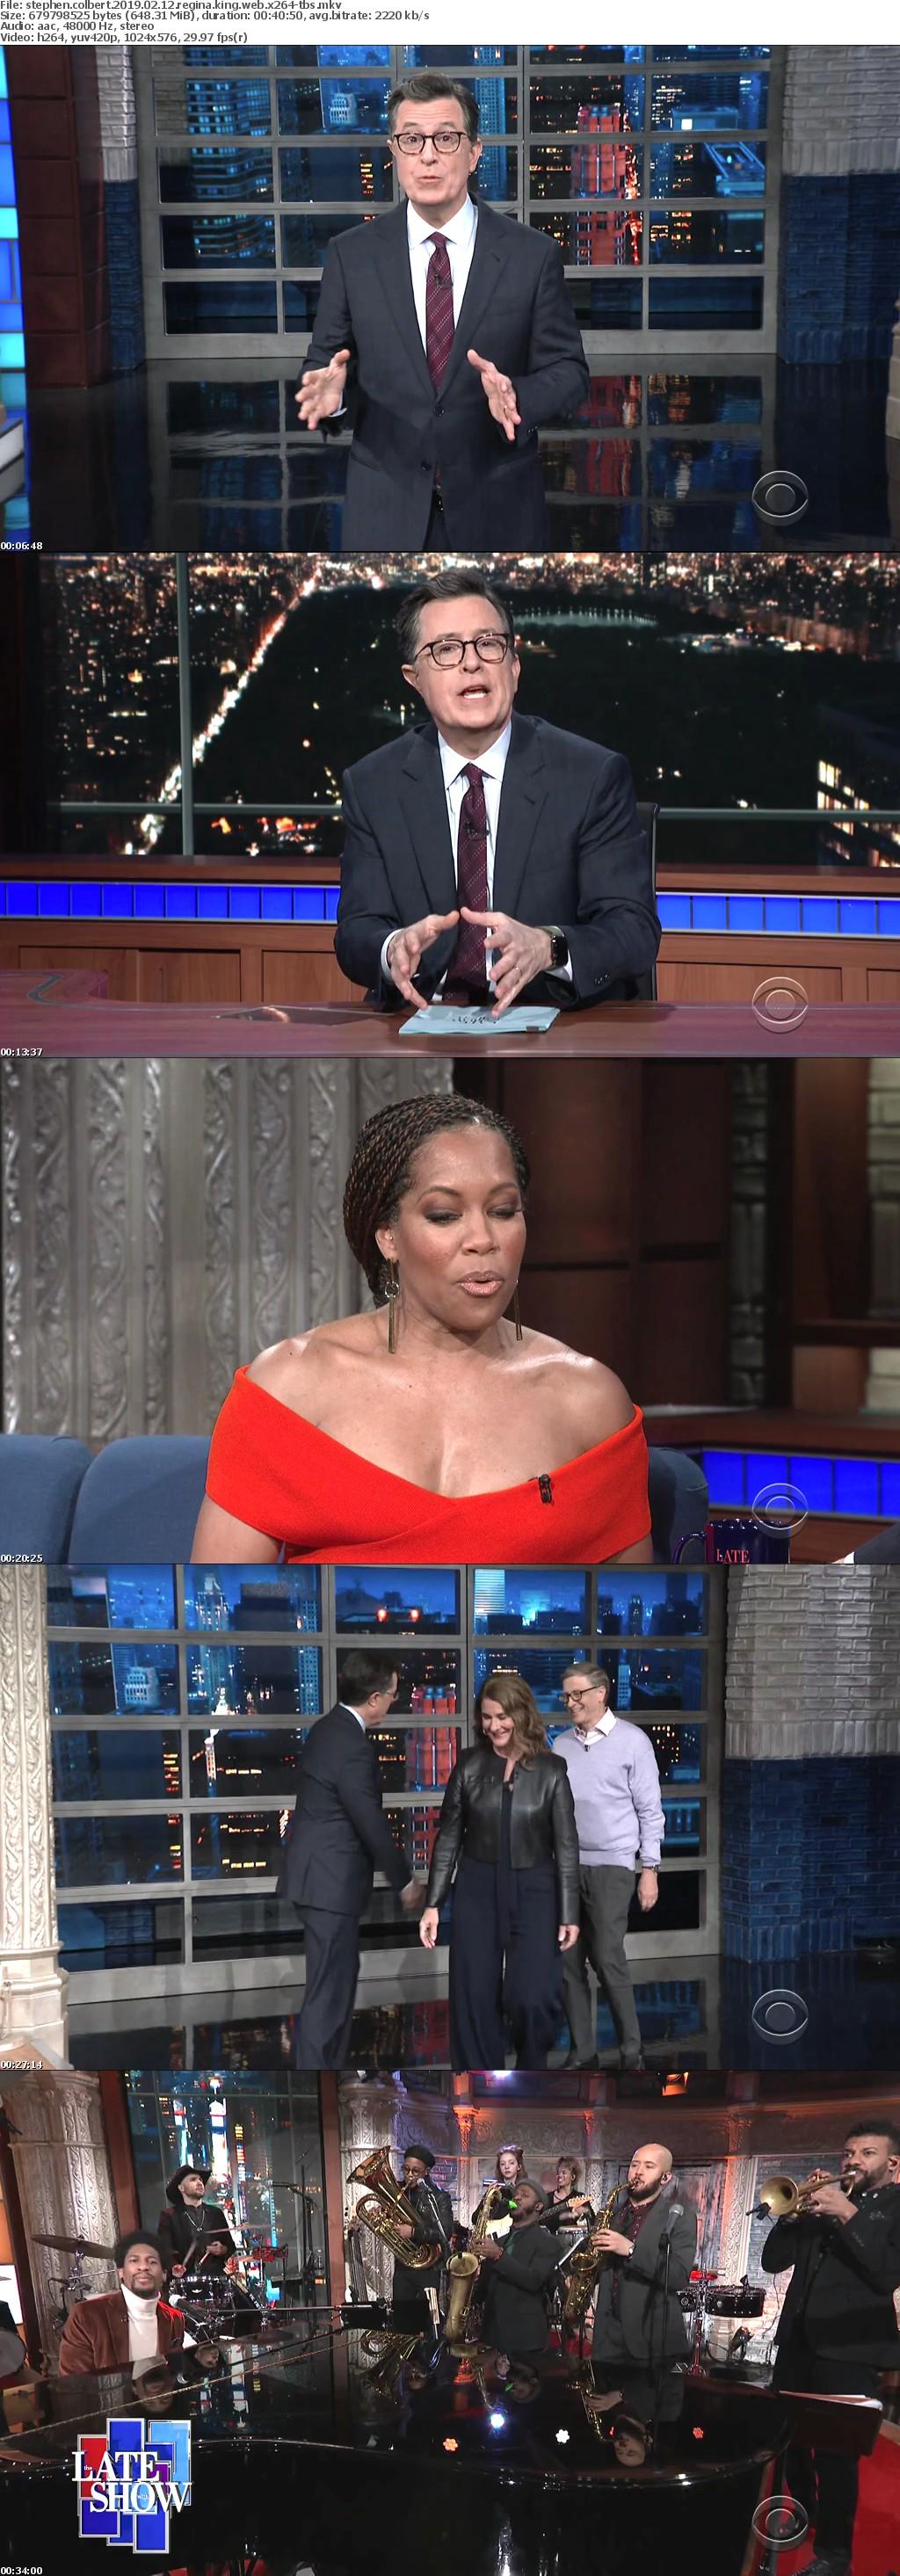 Stephen Colbert 2019 02 12 Regina King WEB x264-TBS